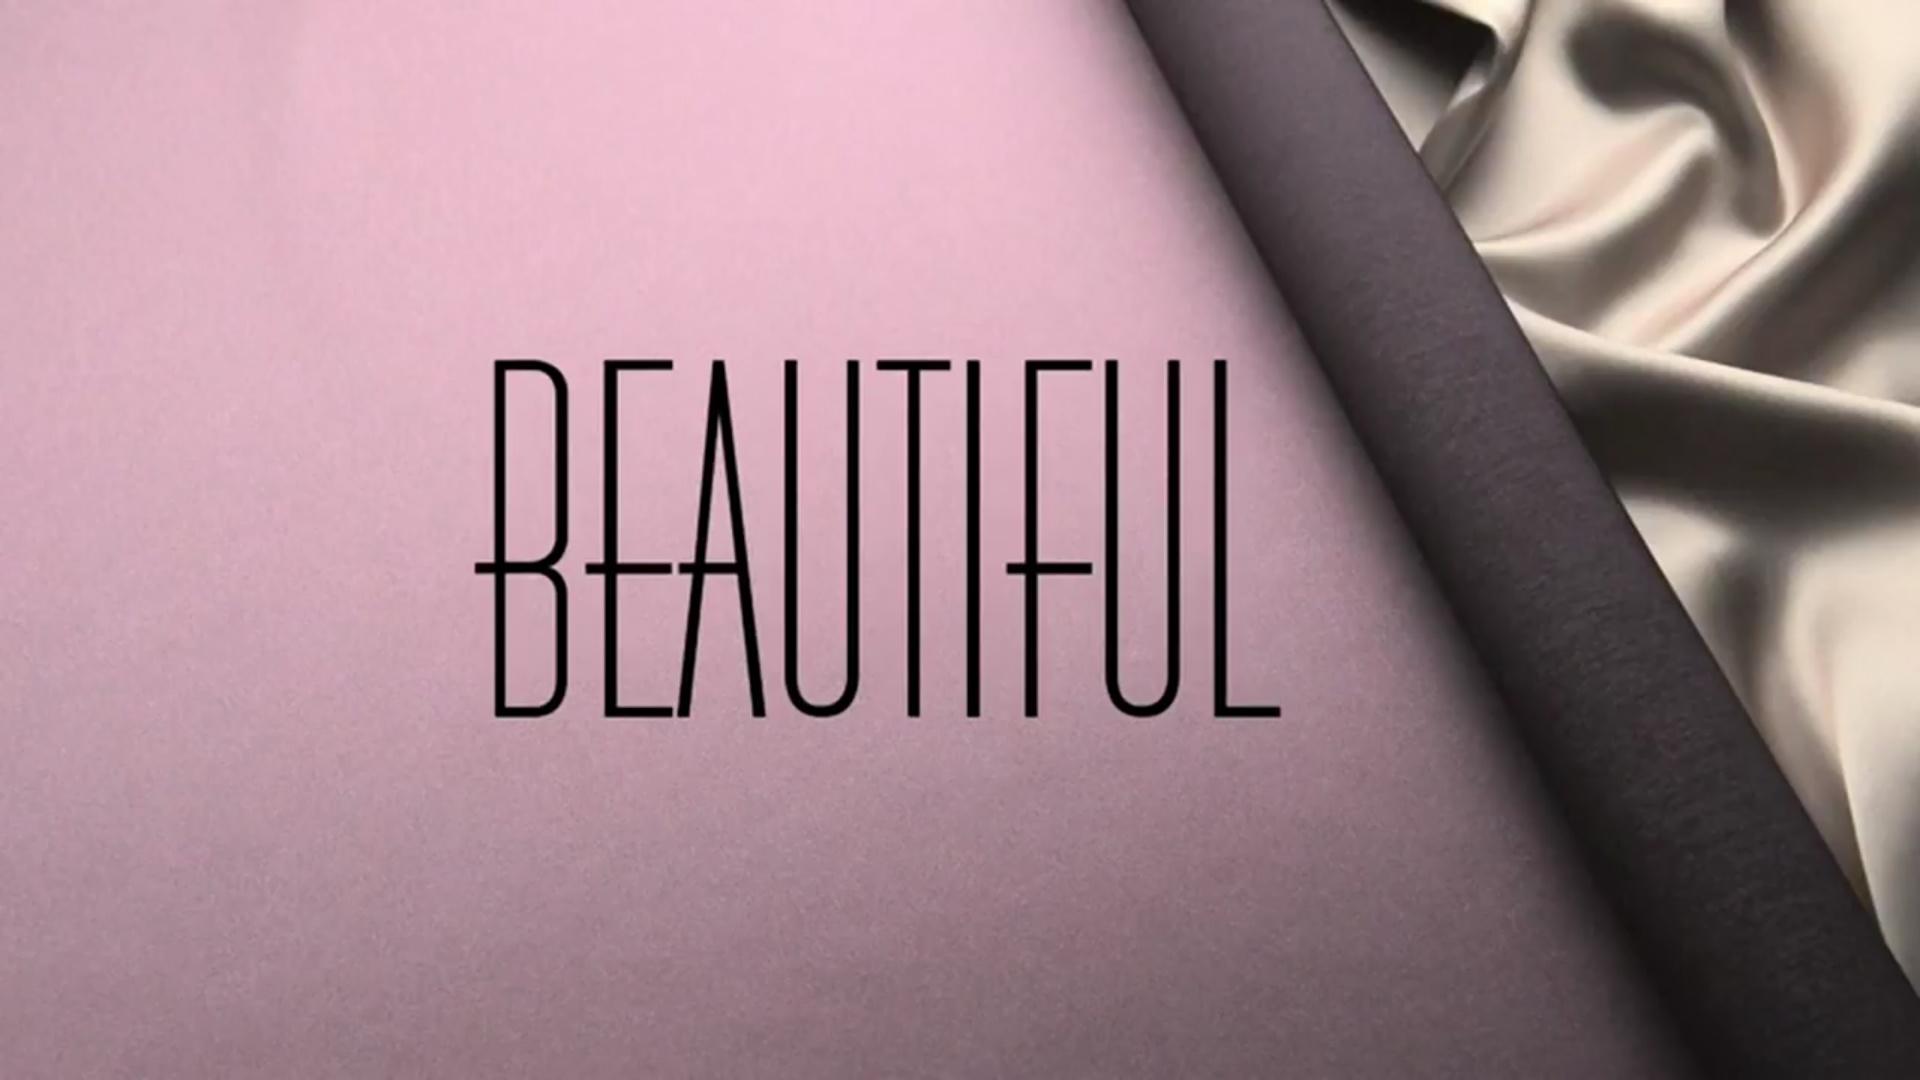 Anticipazioni Beautiful, trame al 26 aprile: Thomas interessato a Hope